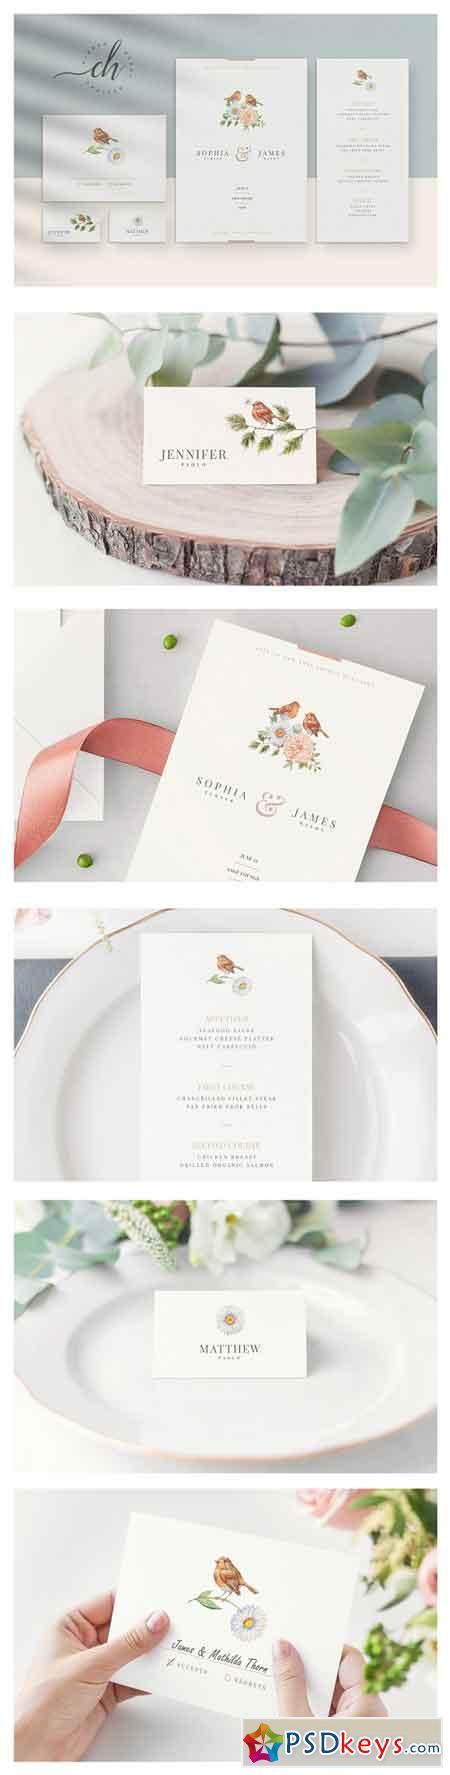 Beryl Wedding Invitation Suite 3275166